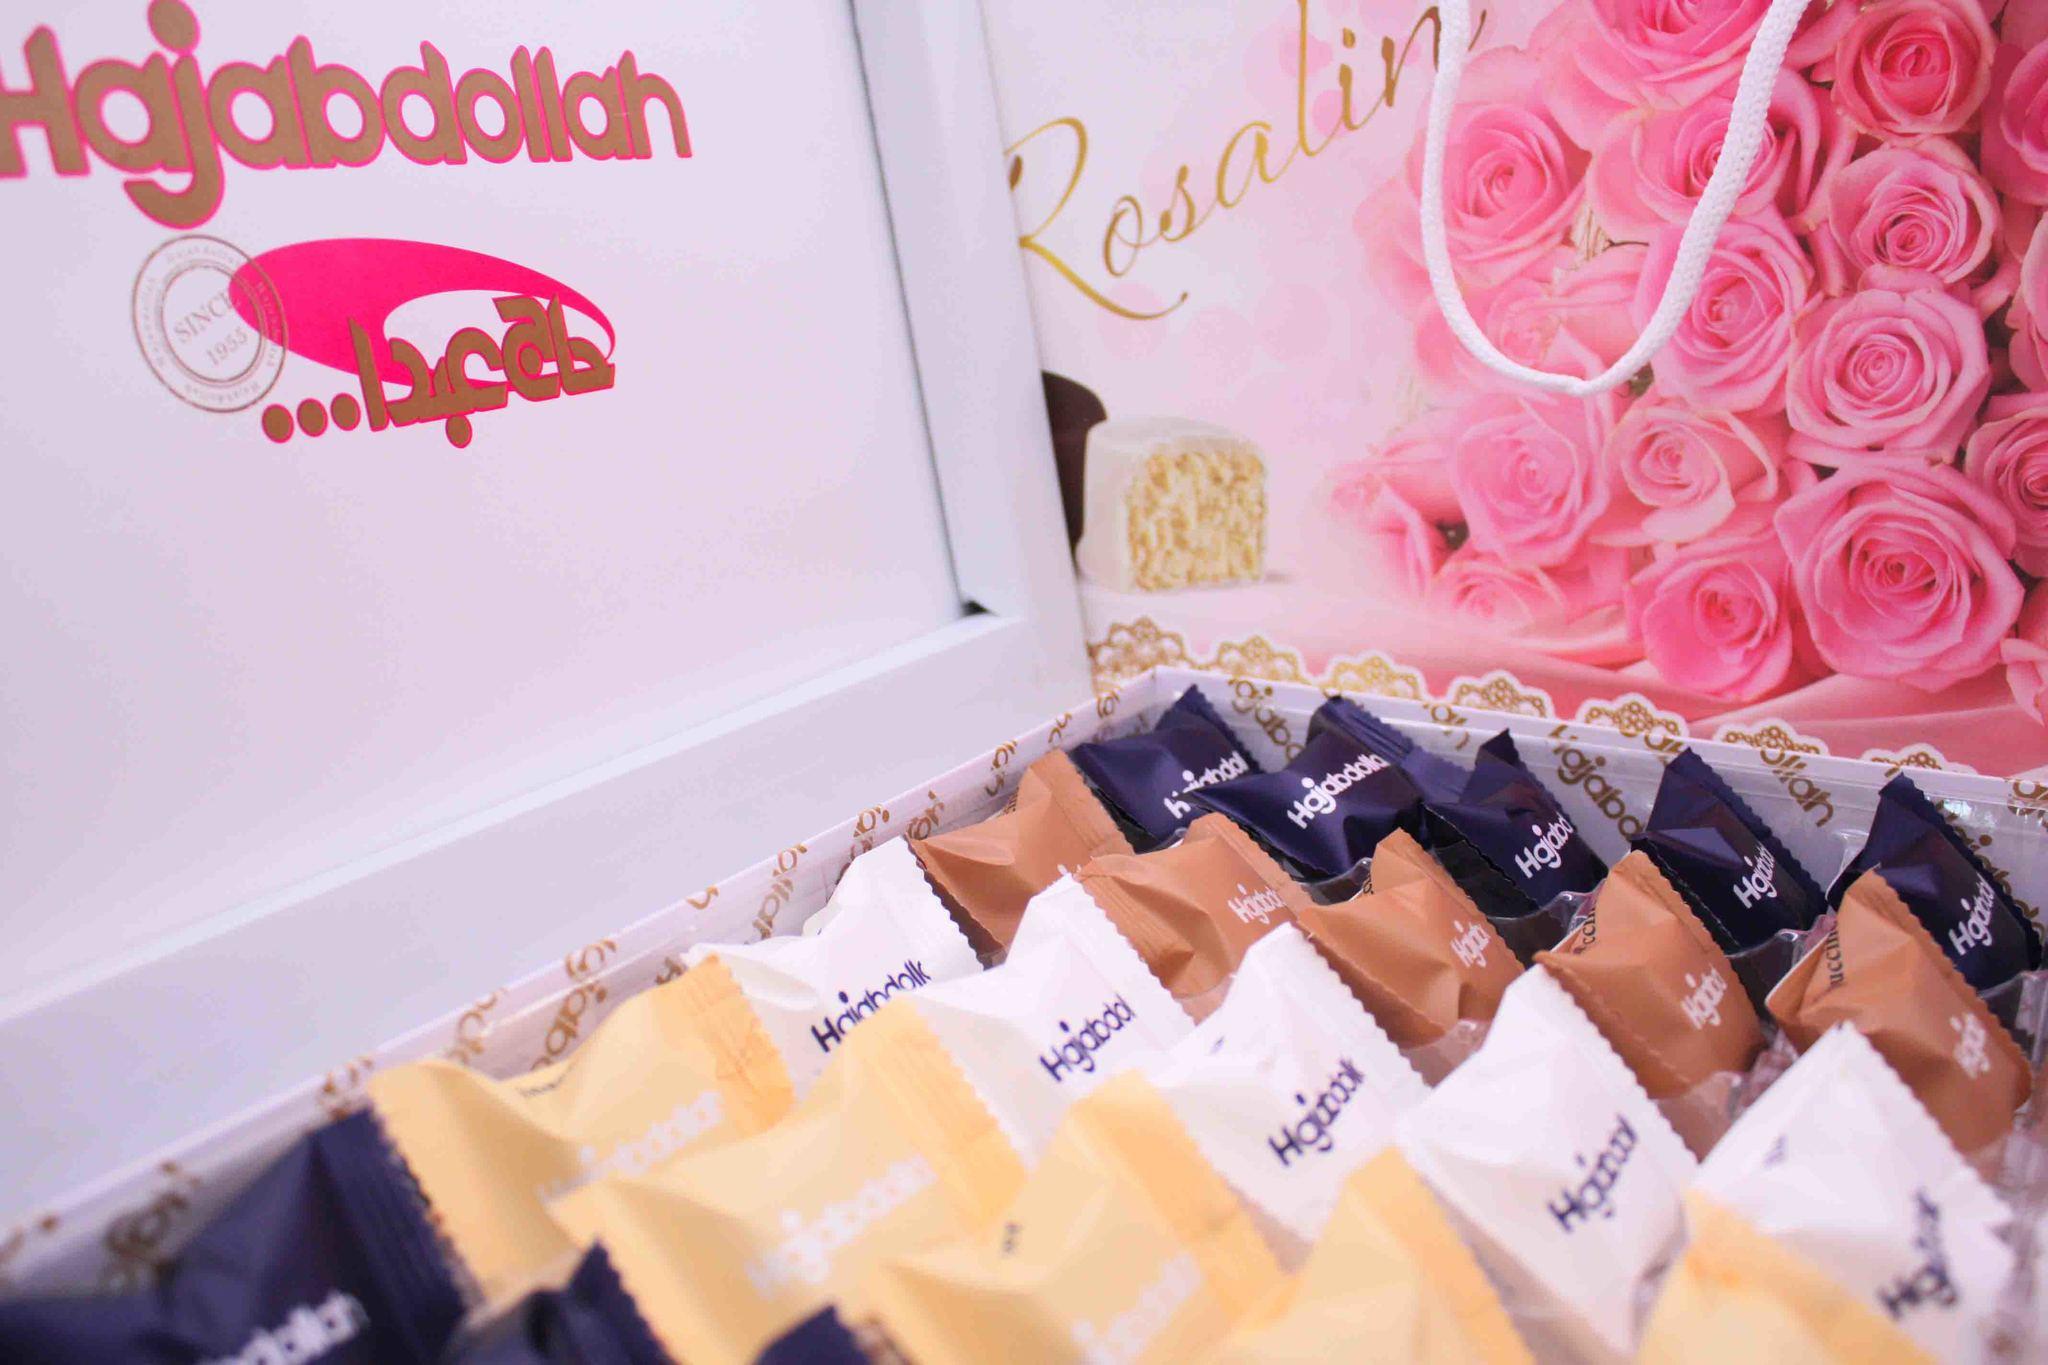 "Hajabdollah Пишмание ""Роза"" с молочным вкусом и вкусом ванили, кофе и имбиря (розовый), Hajabdollah, 300 г import_files_a4_a4c9ef03e86511e9a9b7484d7ecee297_ca1bb5b47afc11eaa9c8484d7ecee297.jpg"